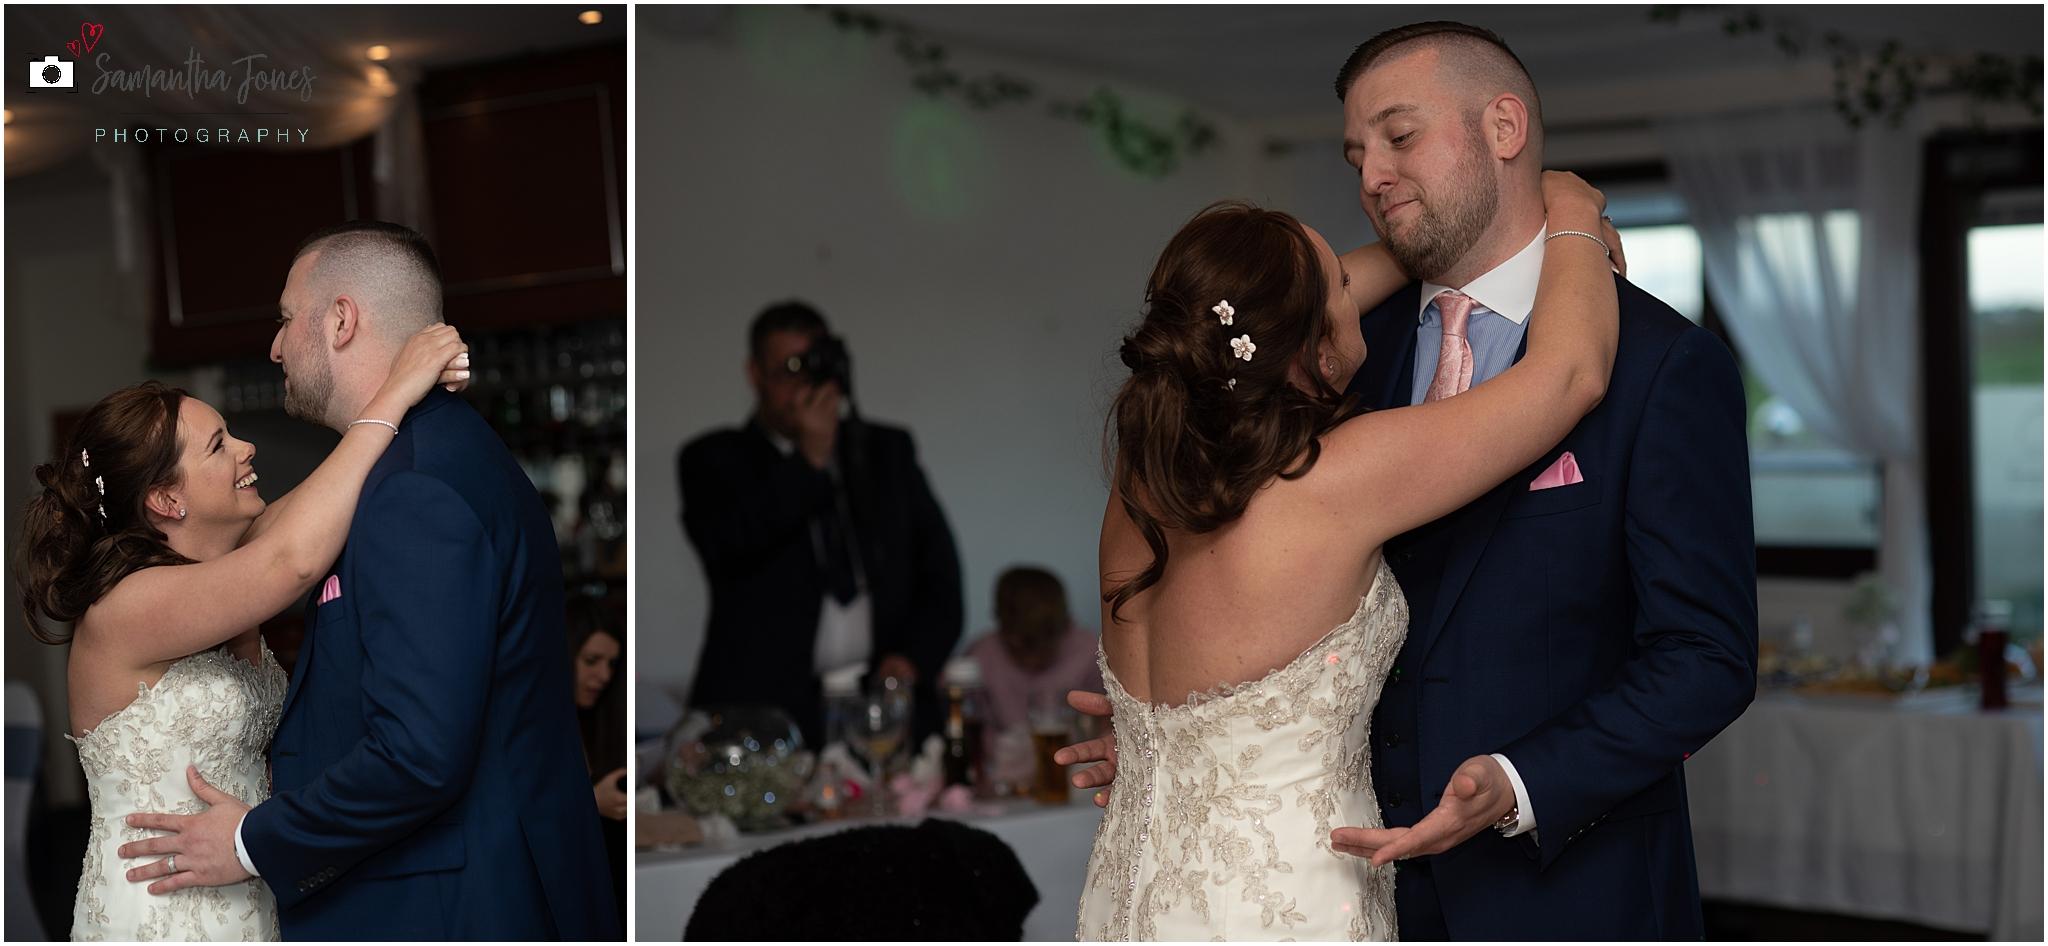 Emma and Aaron twilight wedding at Stonelees first dance